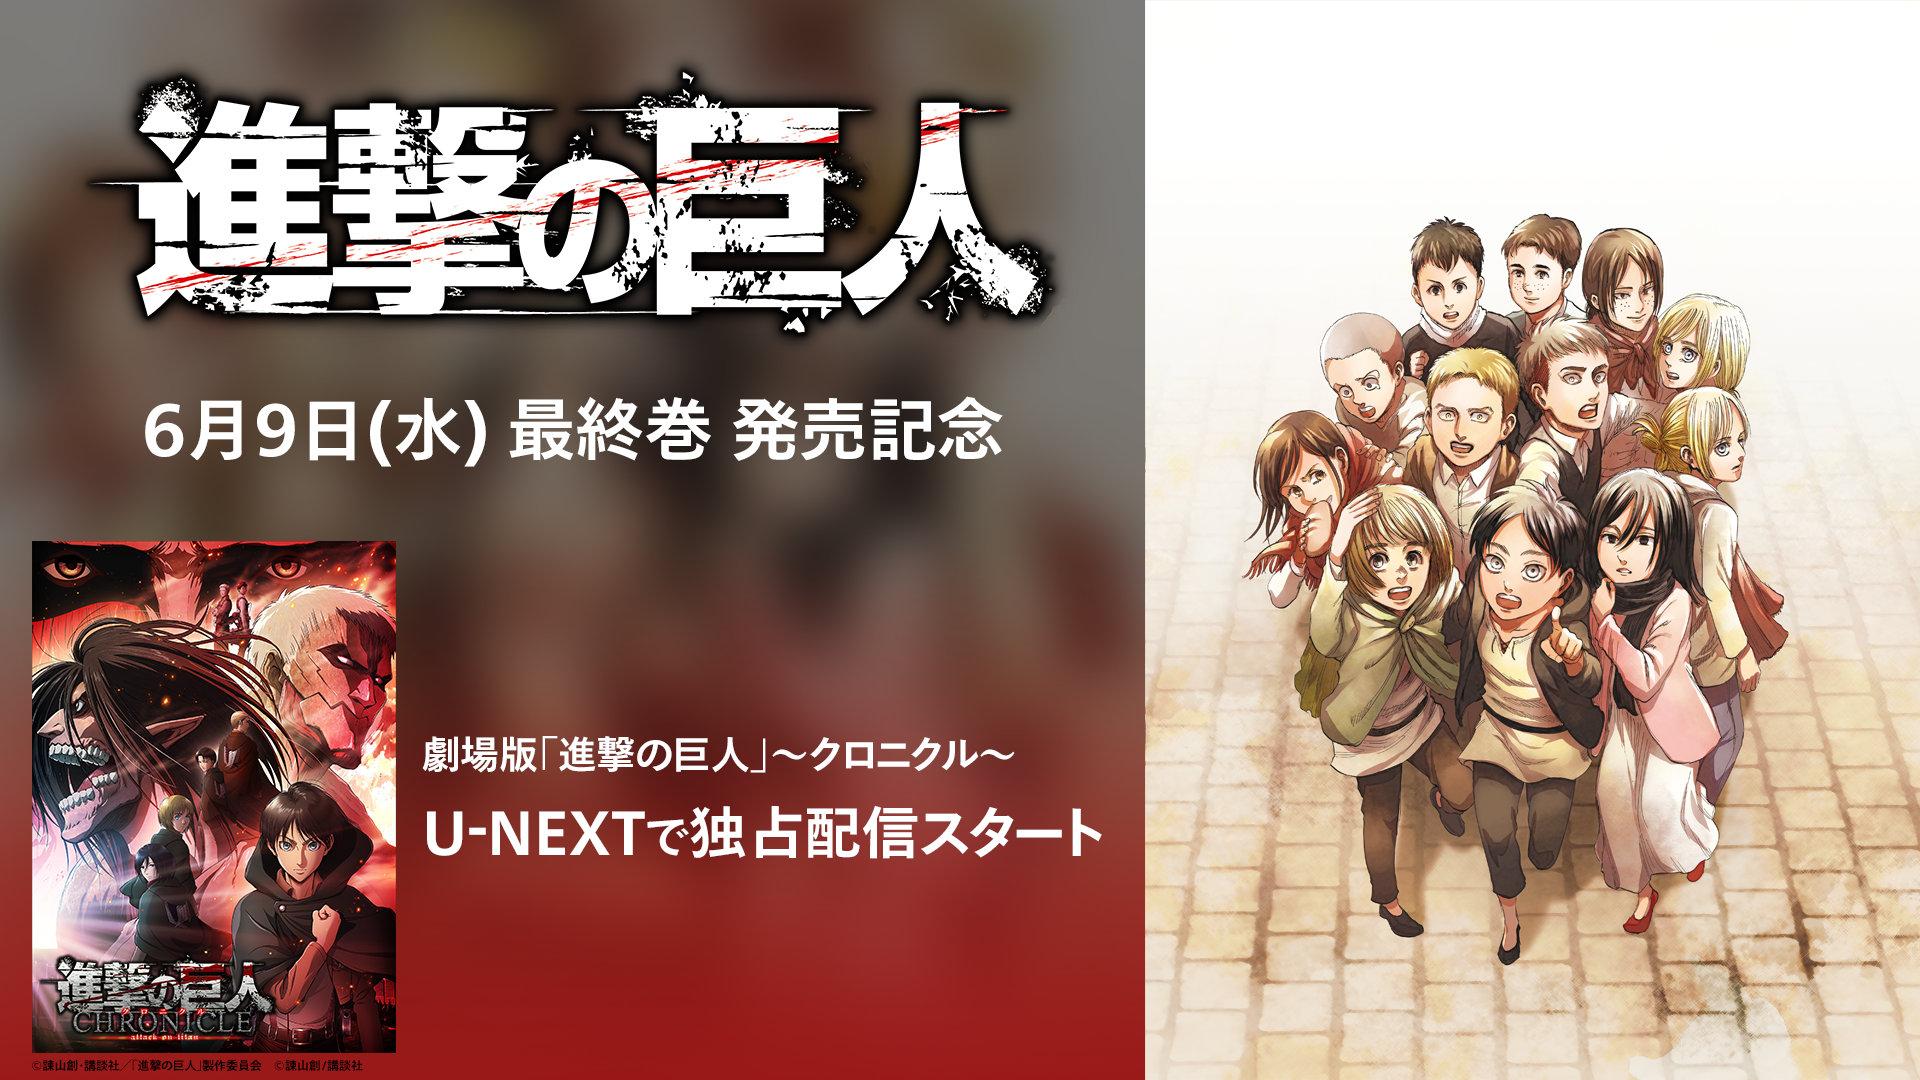 【U-NEXT】『進撃の巨人』最終巻発売・完結記念で『劇場版「進撃の巨人」~クロニクル~』を独占配信、試し読み増量キャンペーンも